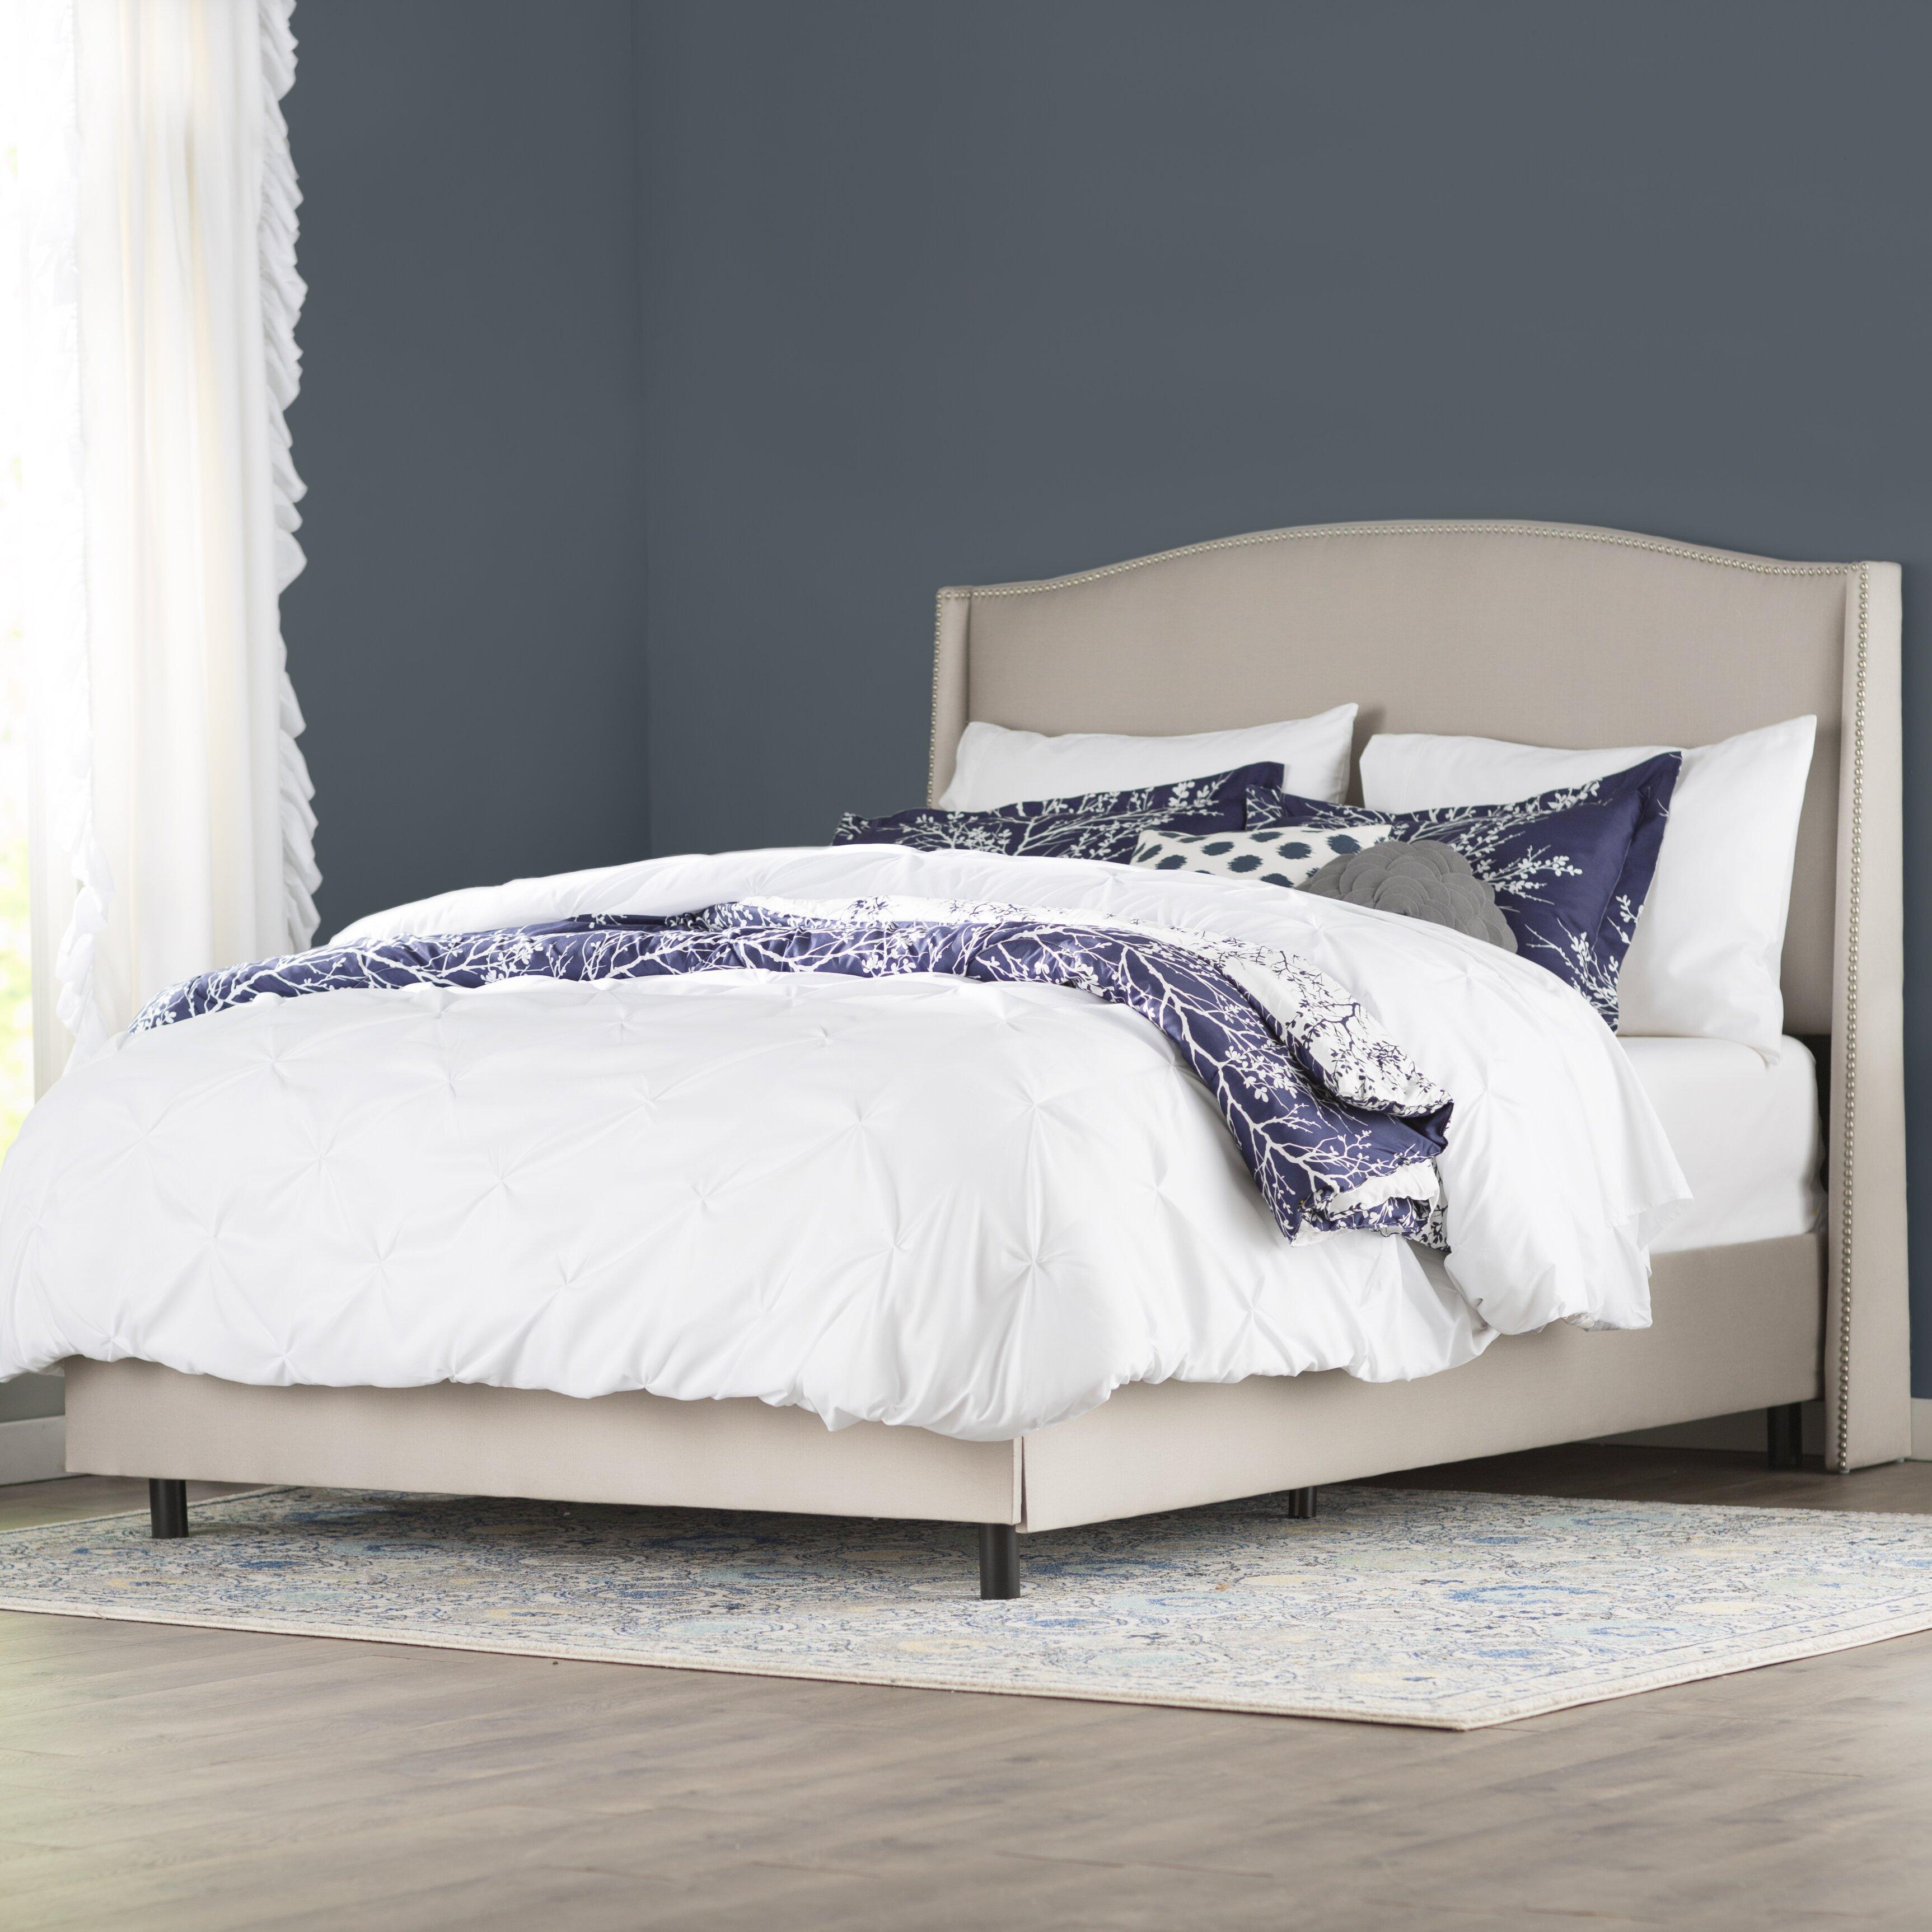 House of hampton brezina upholstered panel bed wayfair for Upholstered dog bed